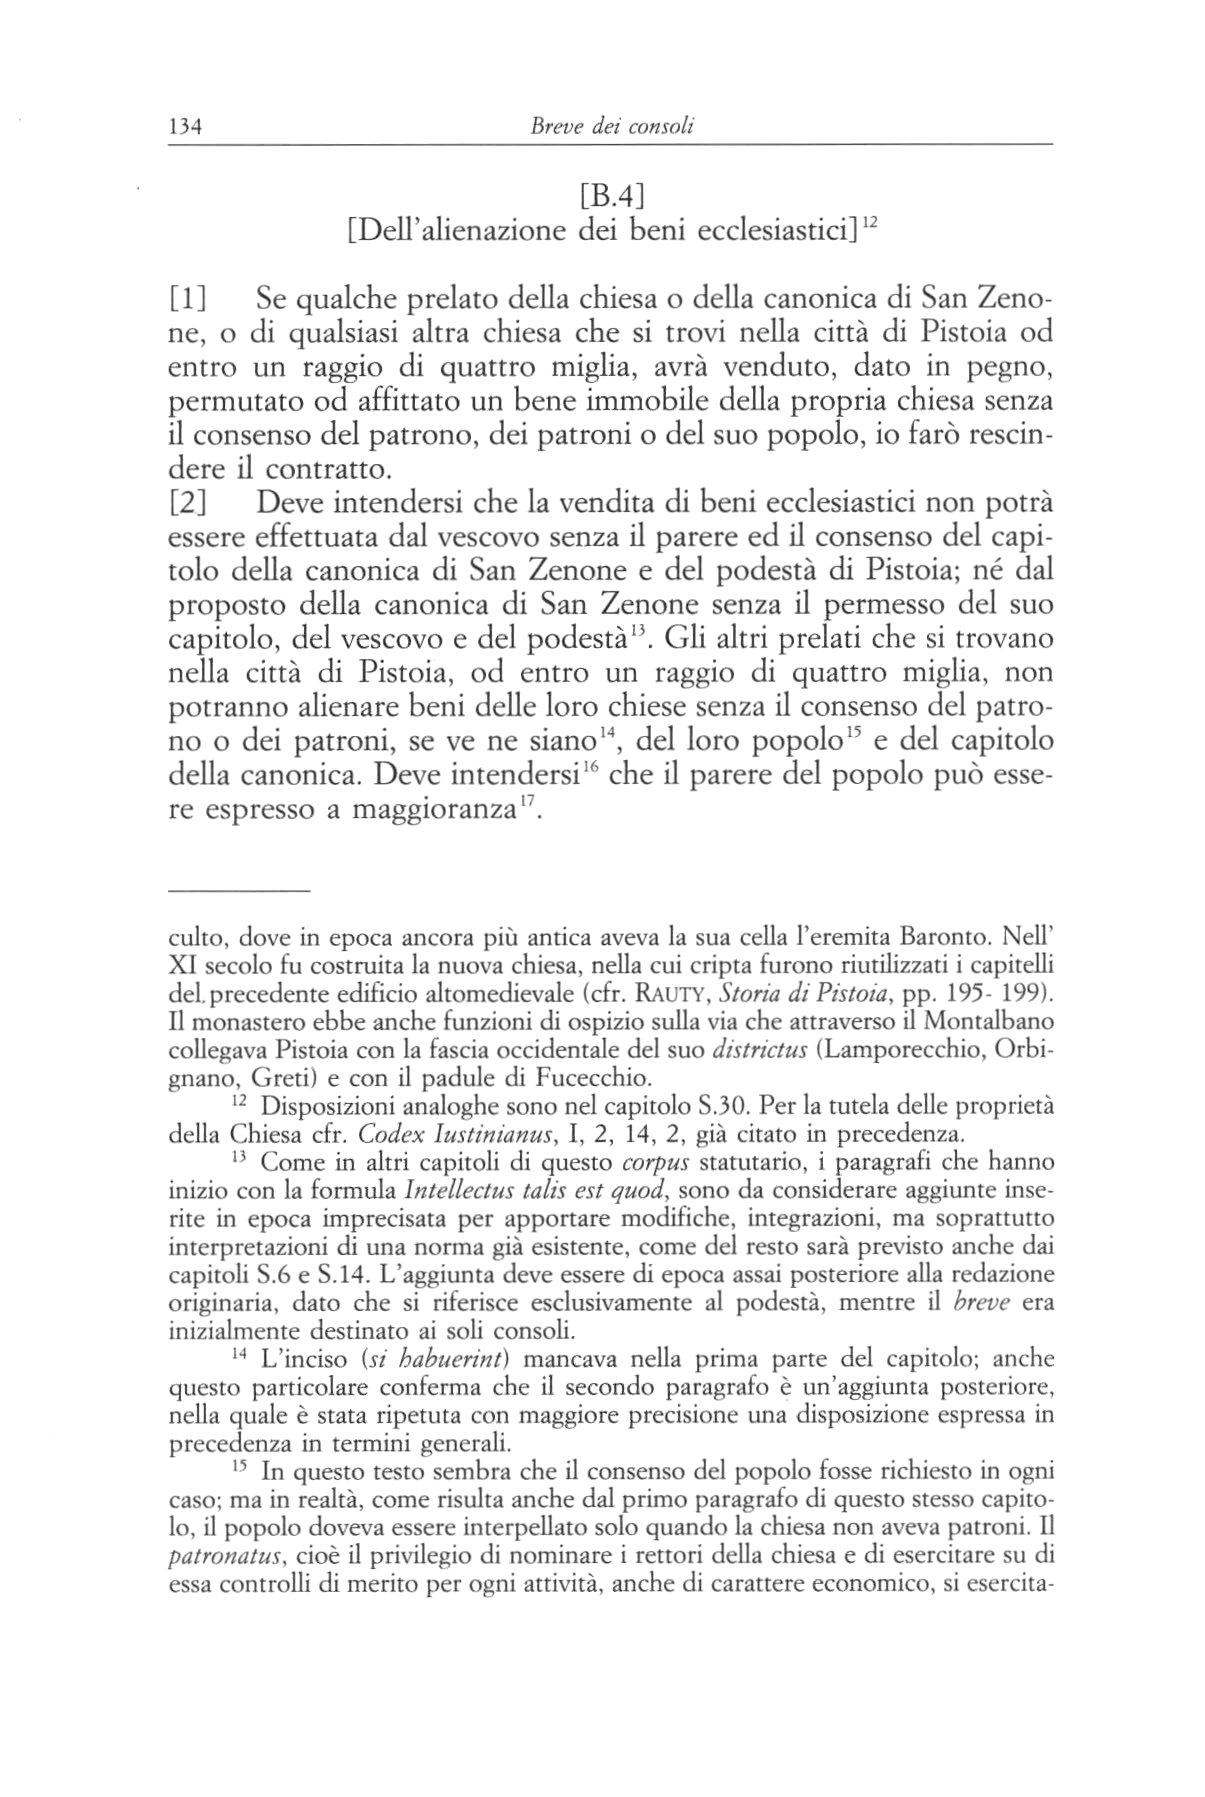 statuti pistoiesi del sec.XII 0134.jpg